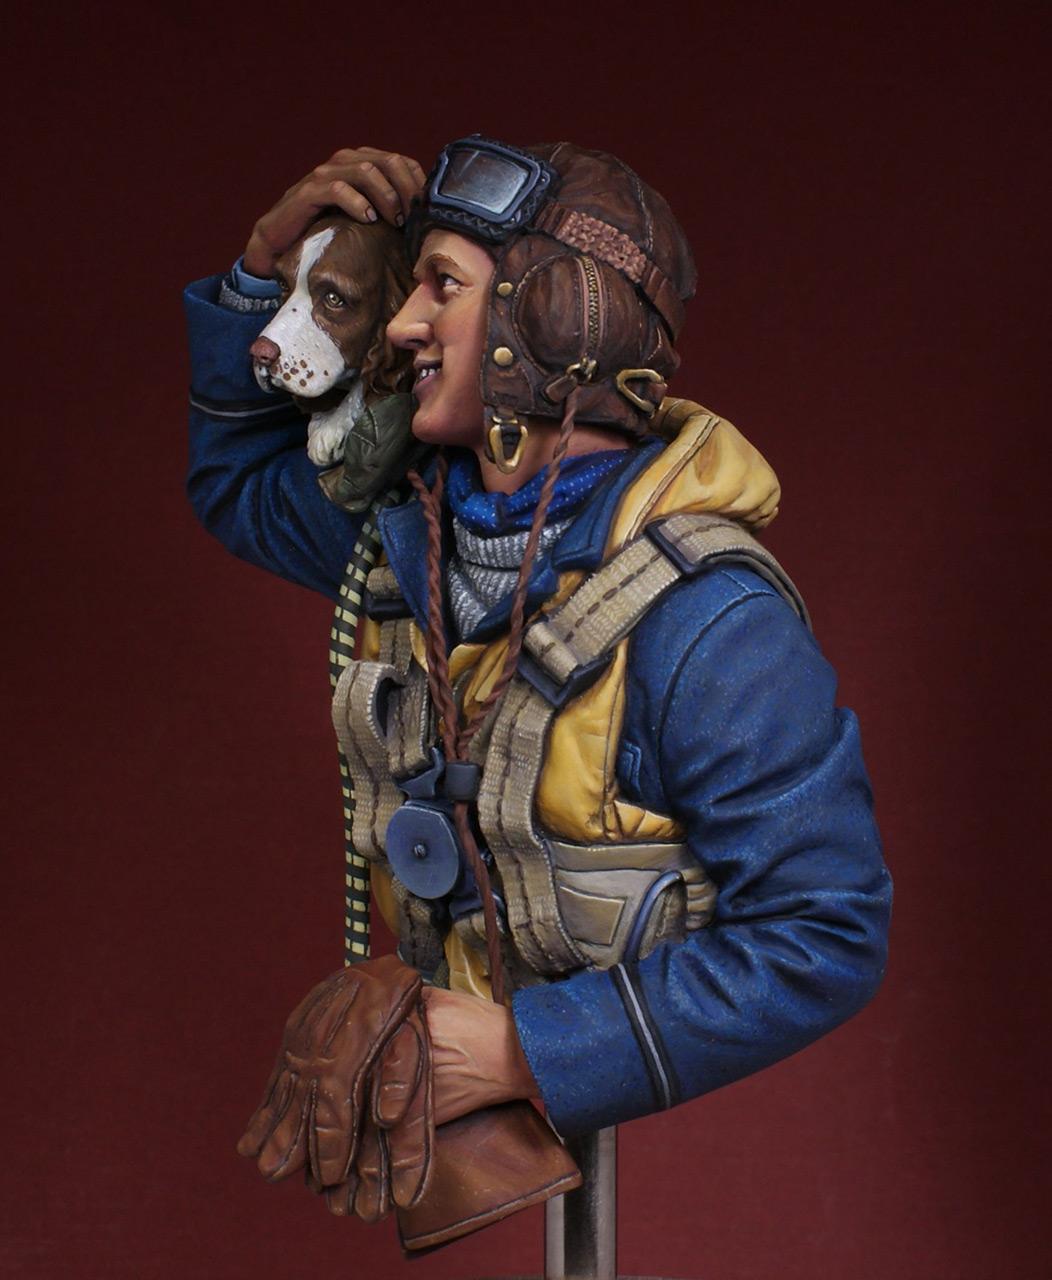 Фигурки: Летчик-истребитель. Битва за Британию, фото #2